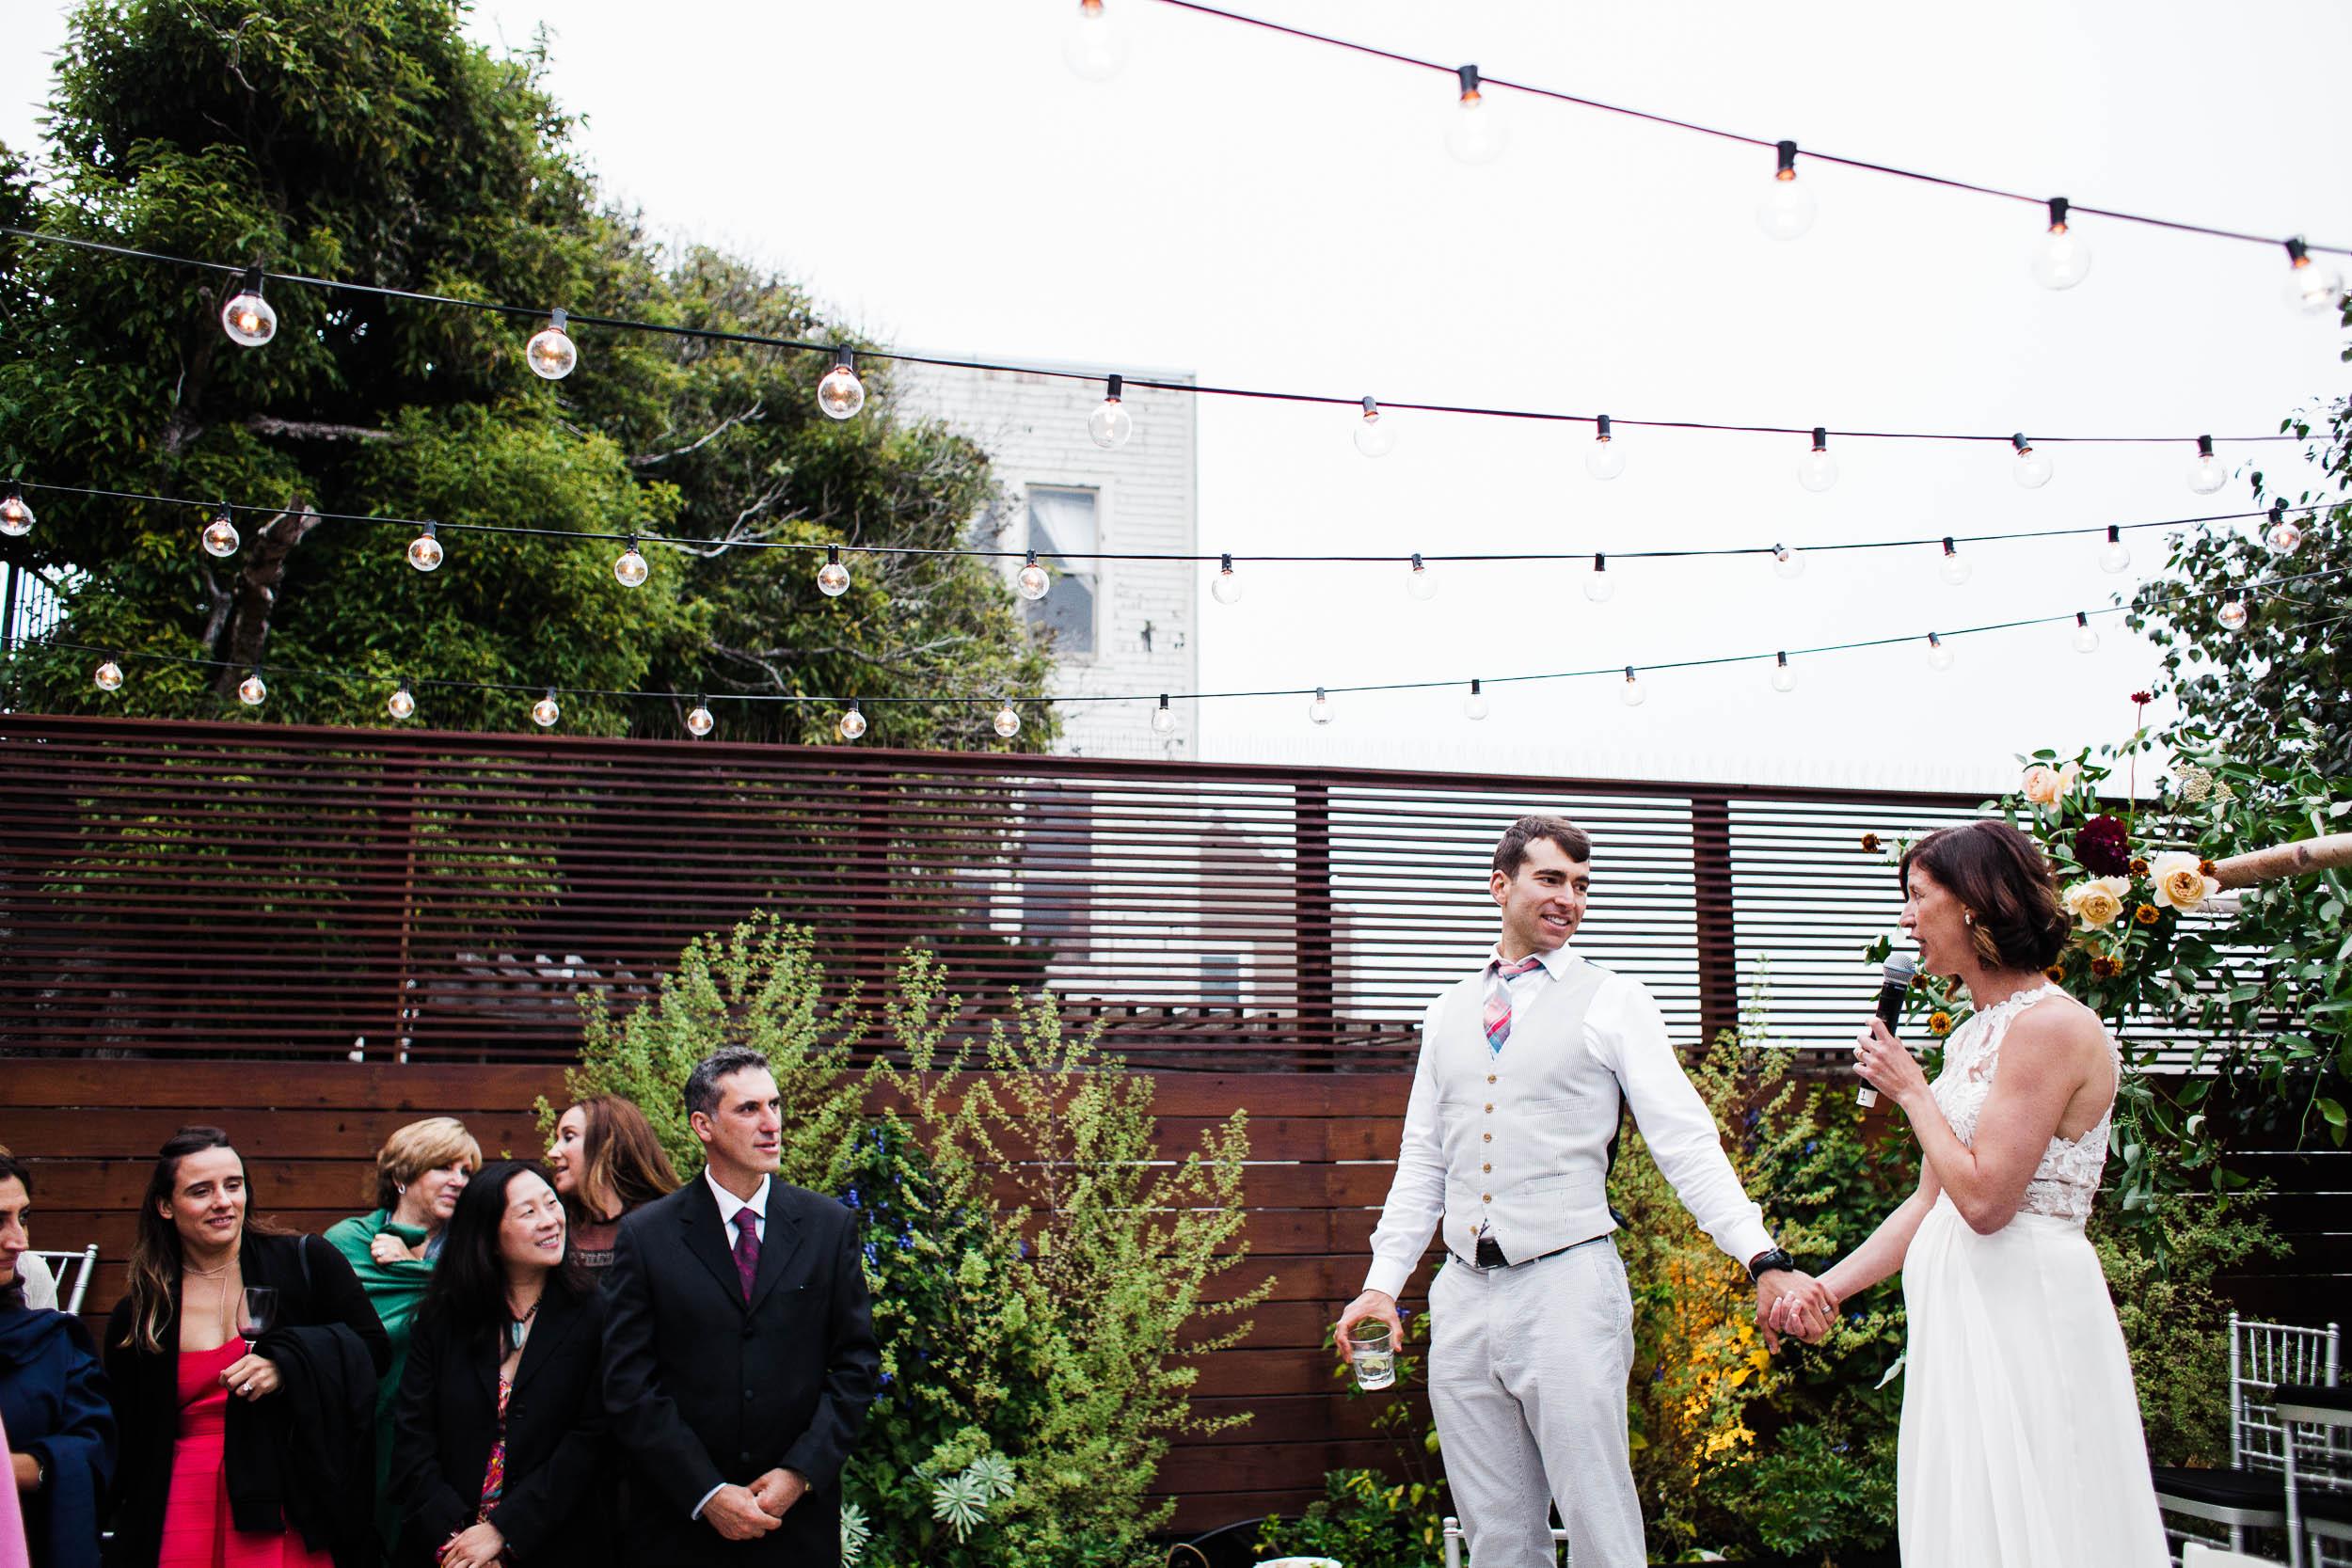 081818_Alina Jason San Francisco Wedding_Buena Lane Photography_2866 copy.jpg